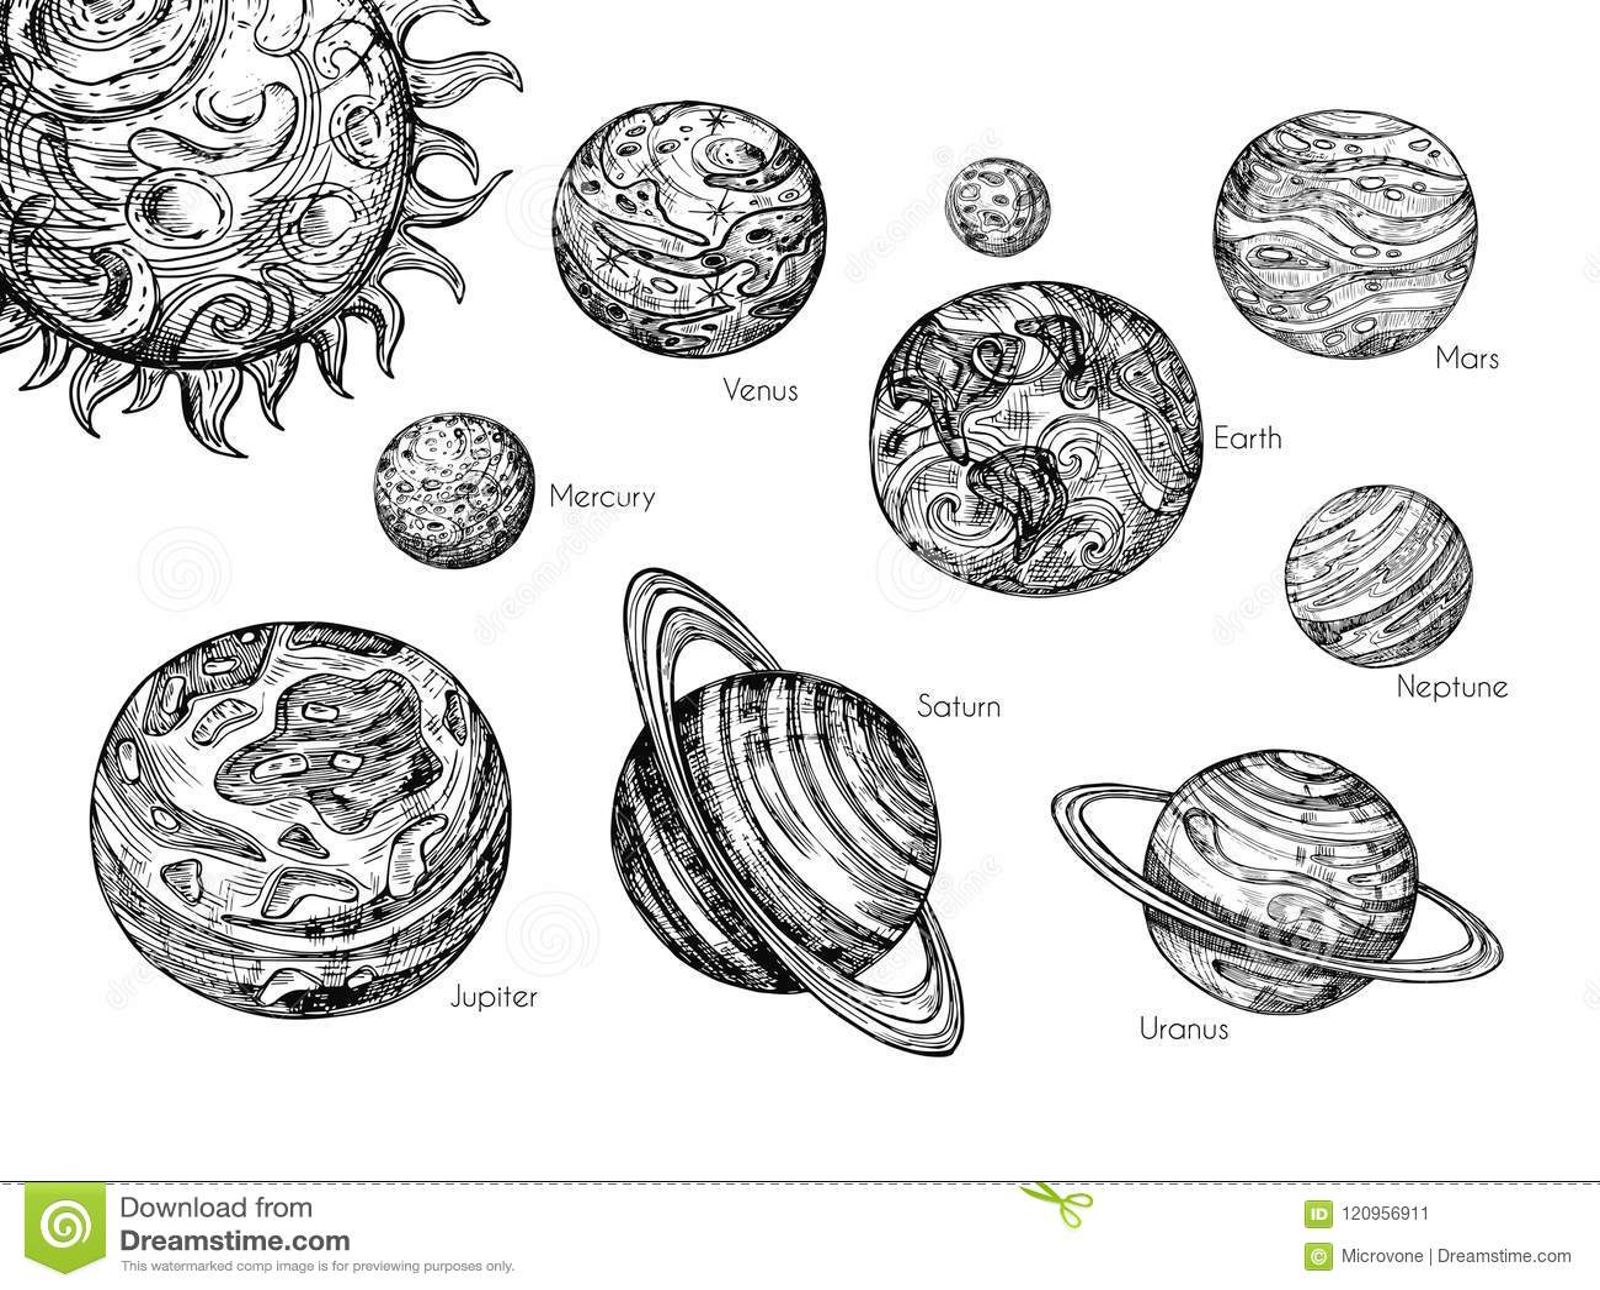 Sketch Solar System Planets Mercury Venus Earth Mars